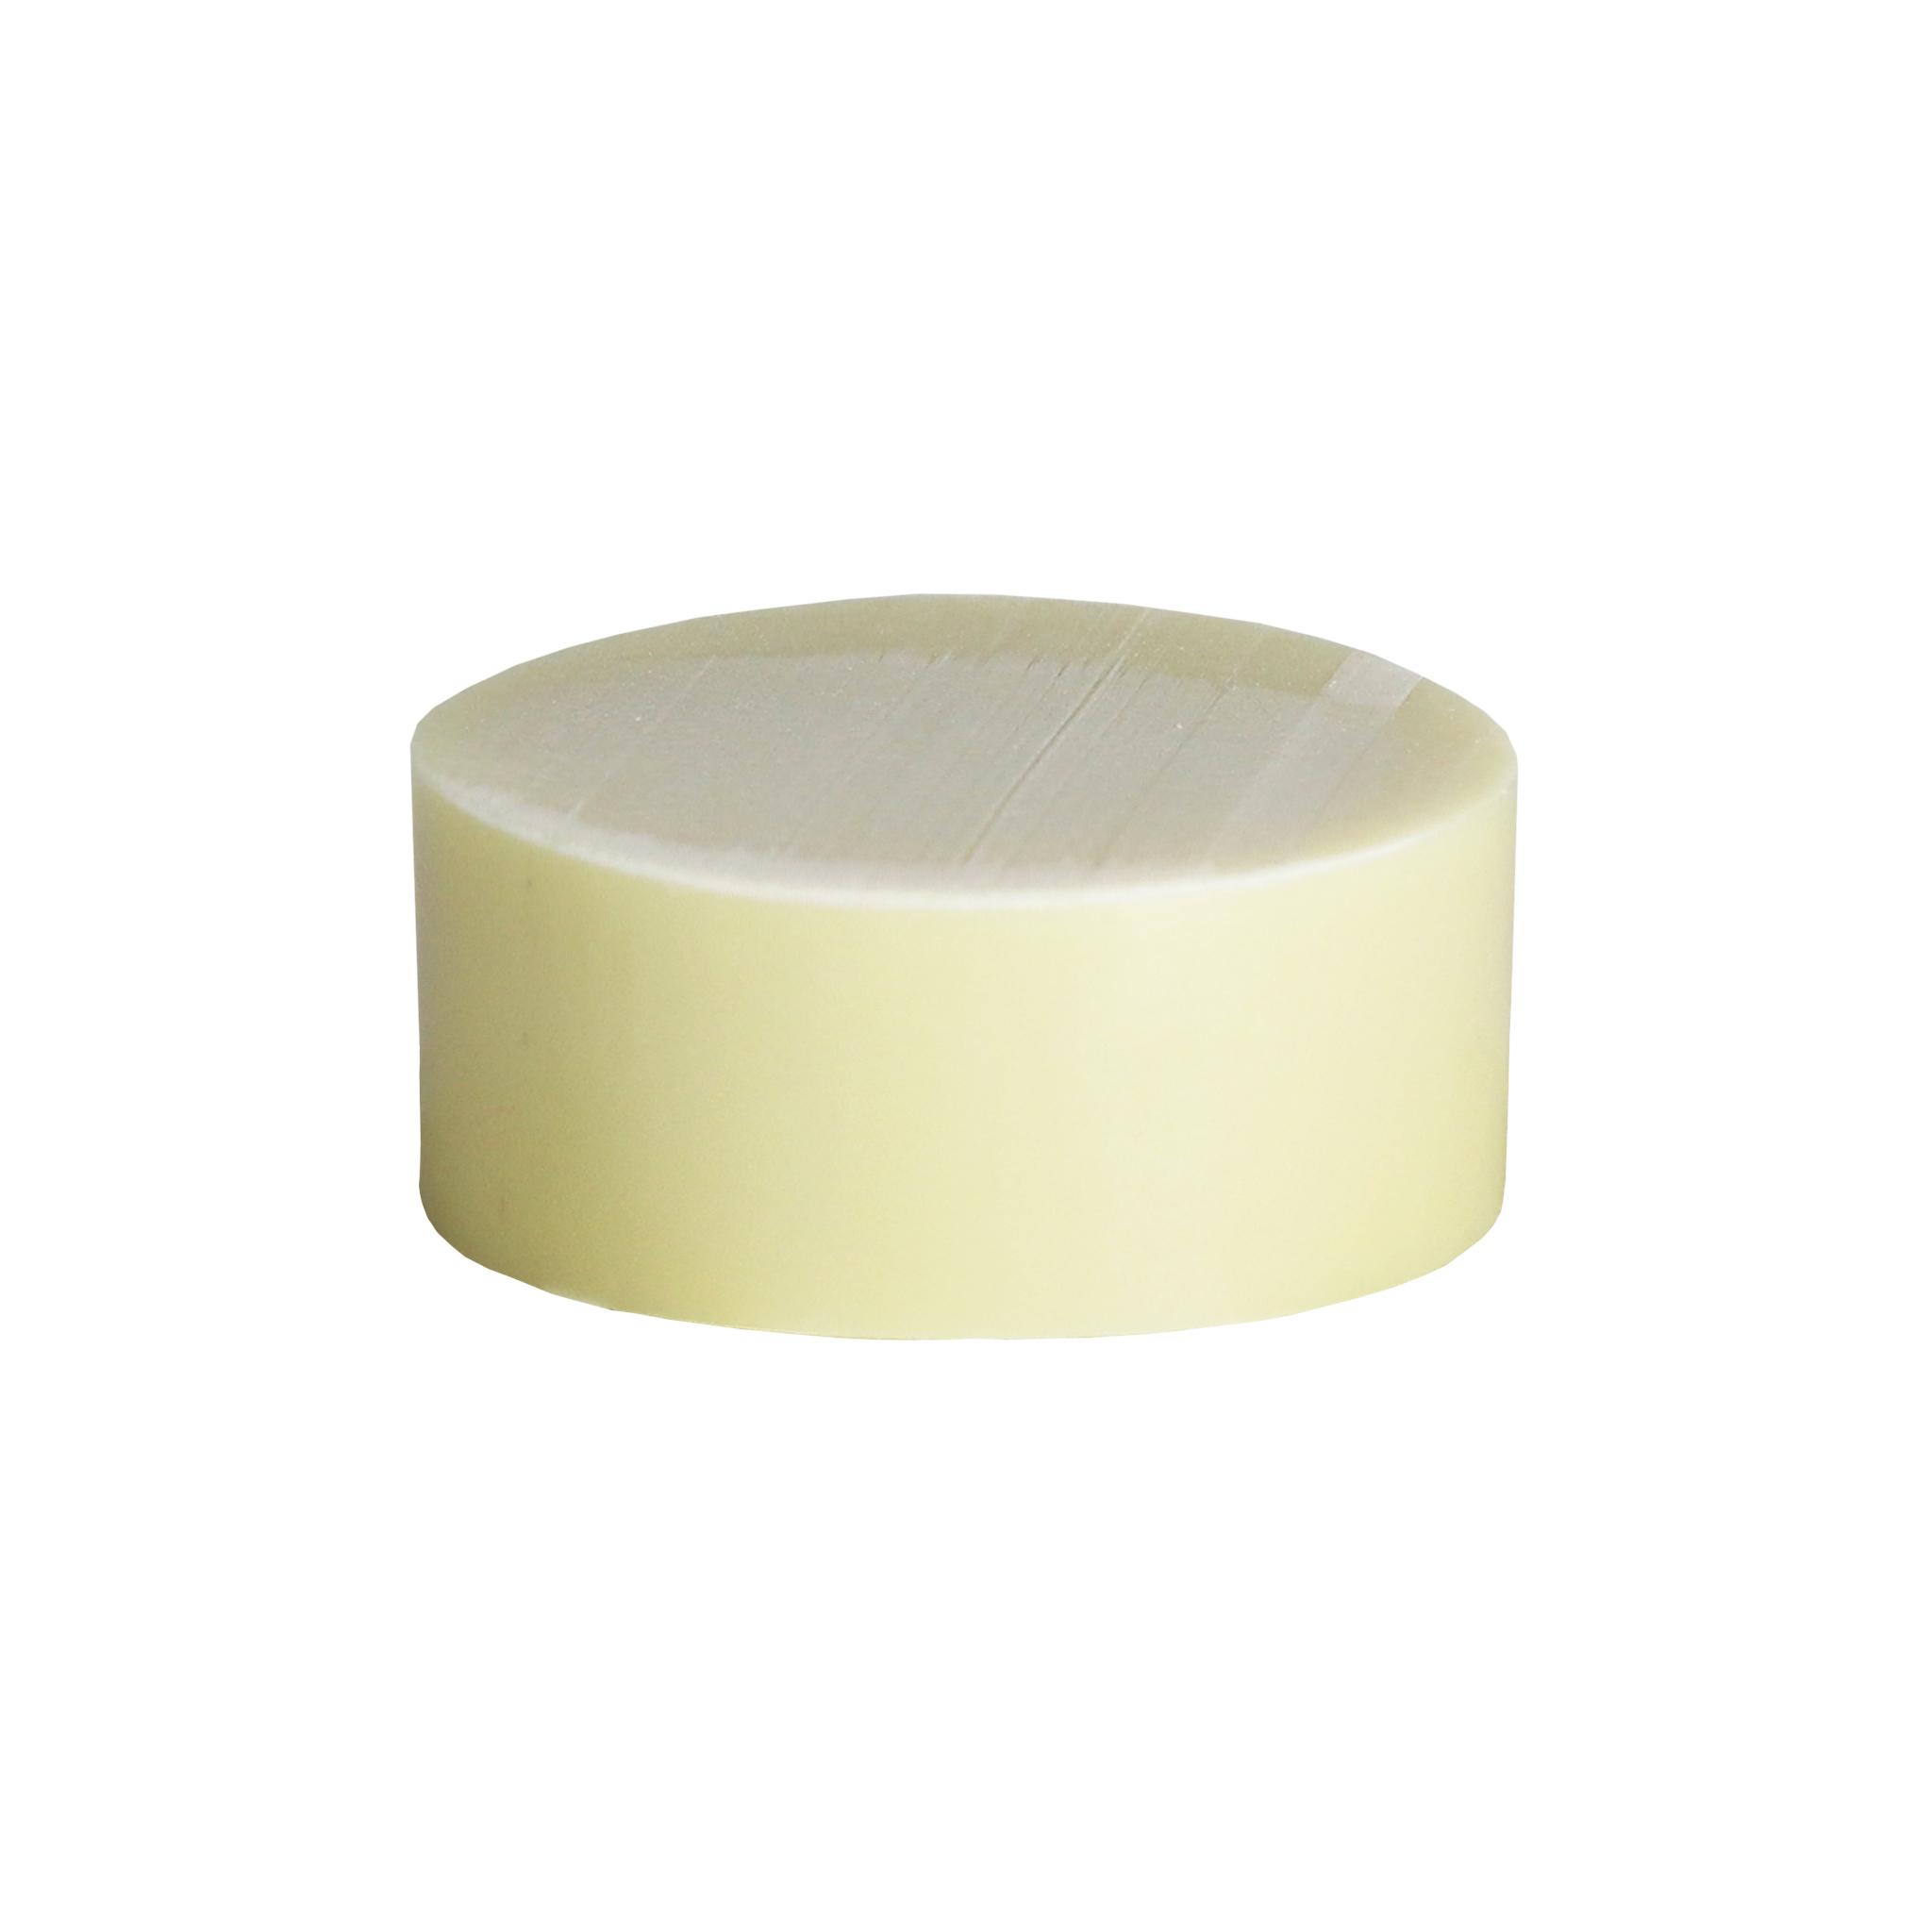 HRANITHERM 1000.30 Transparant - EVA Hot Melt